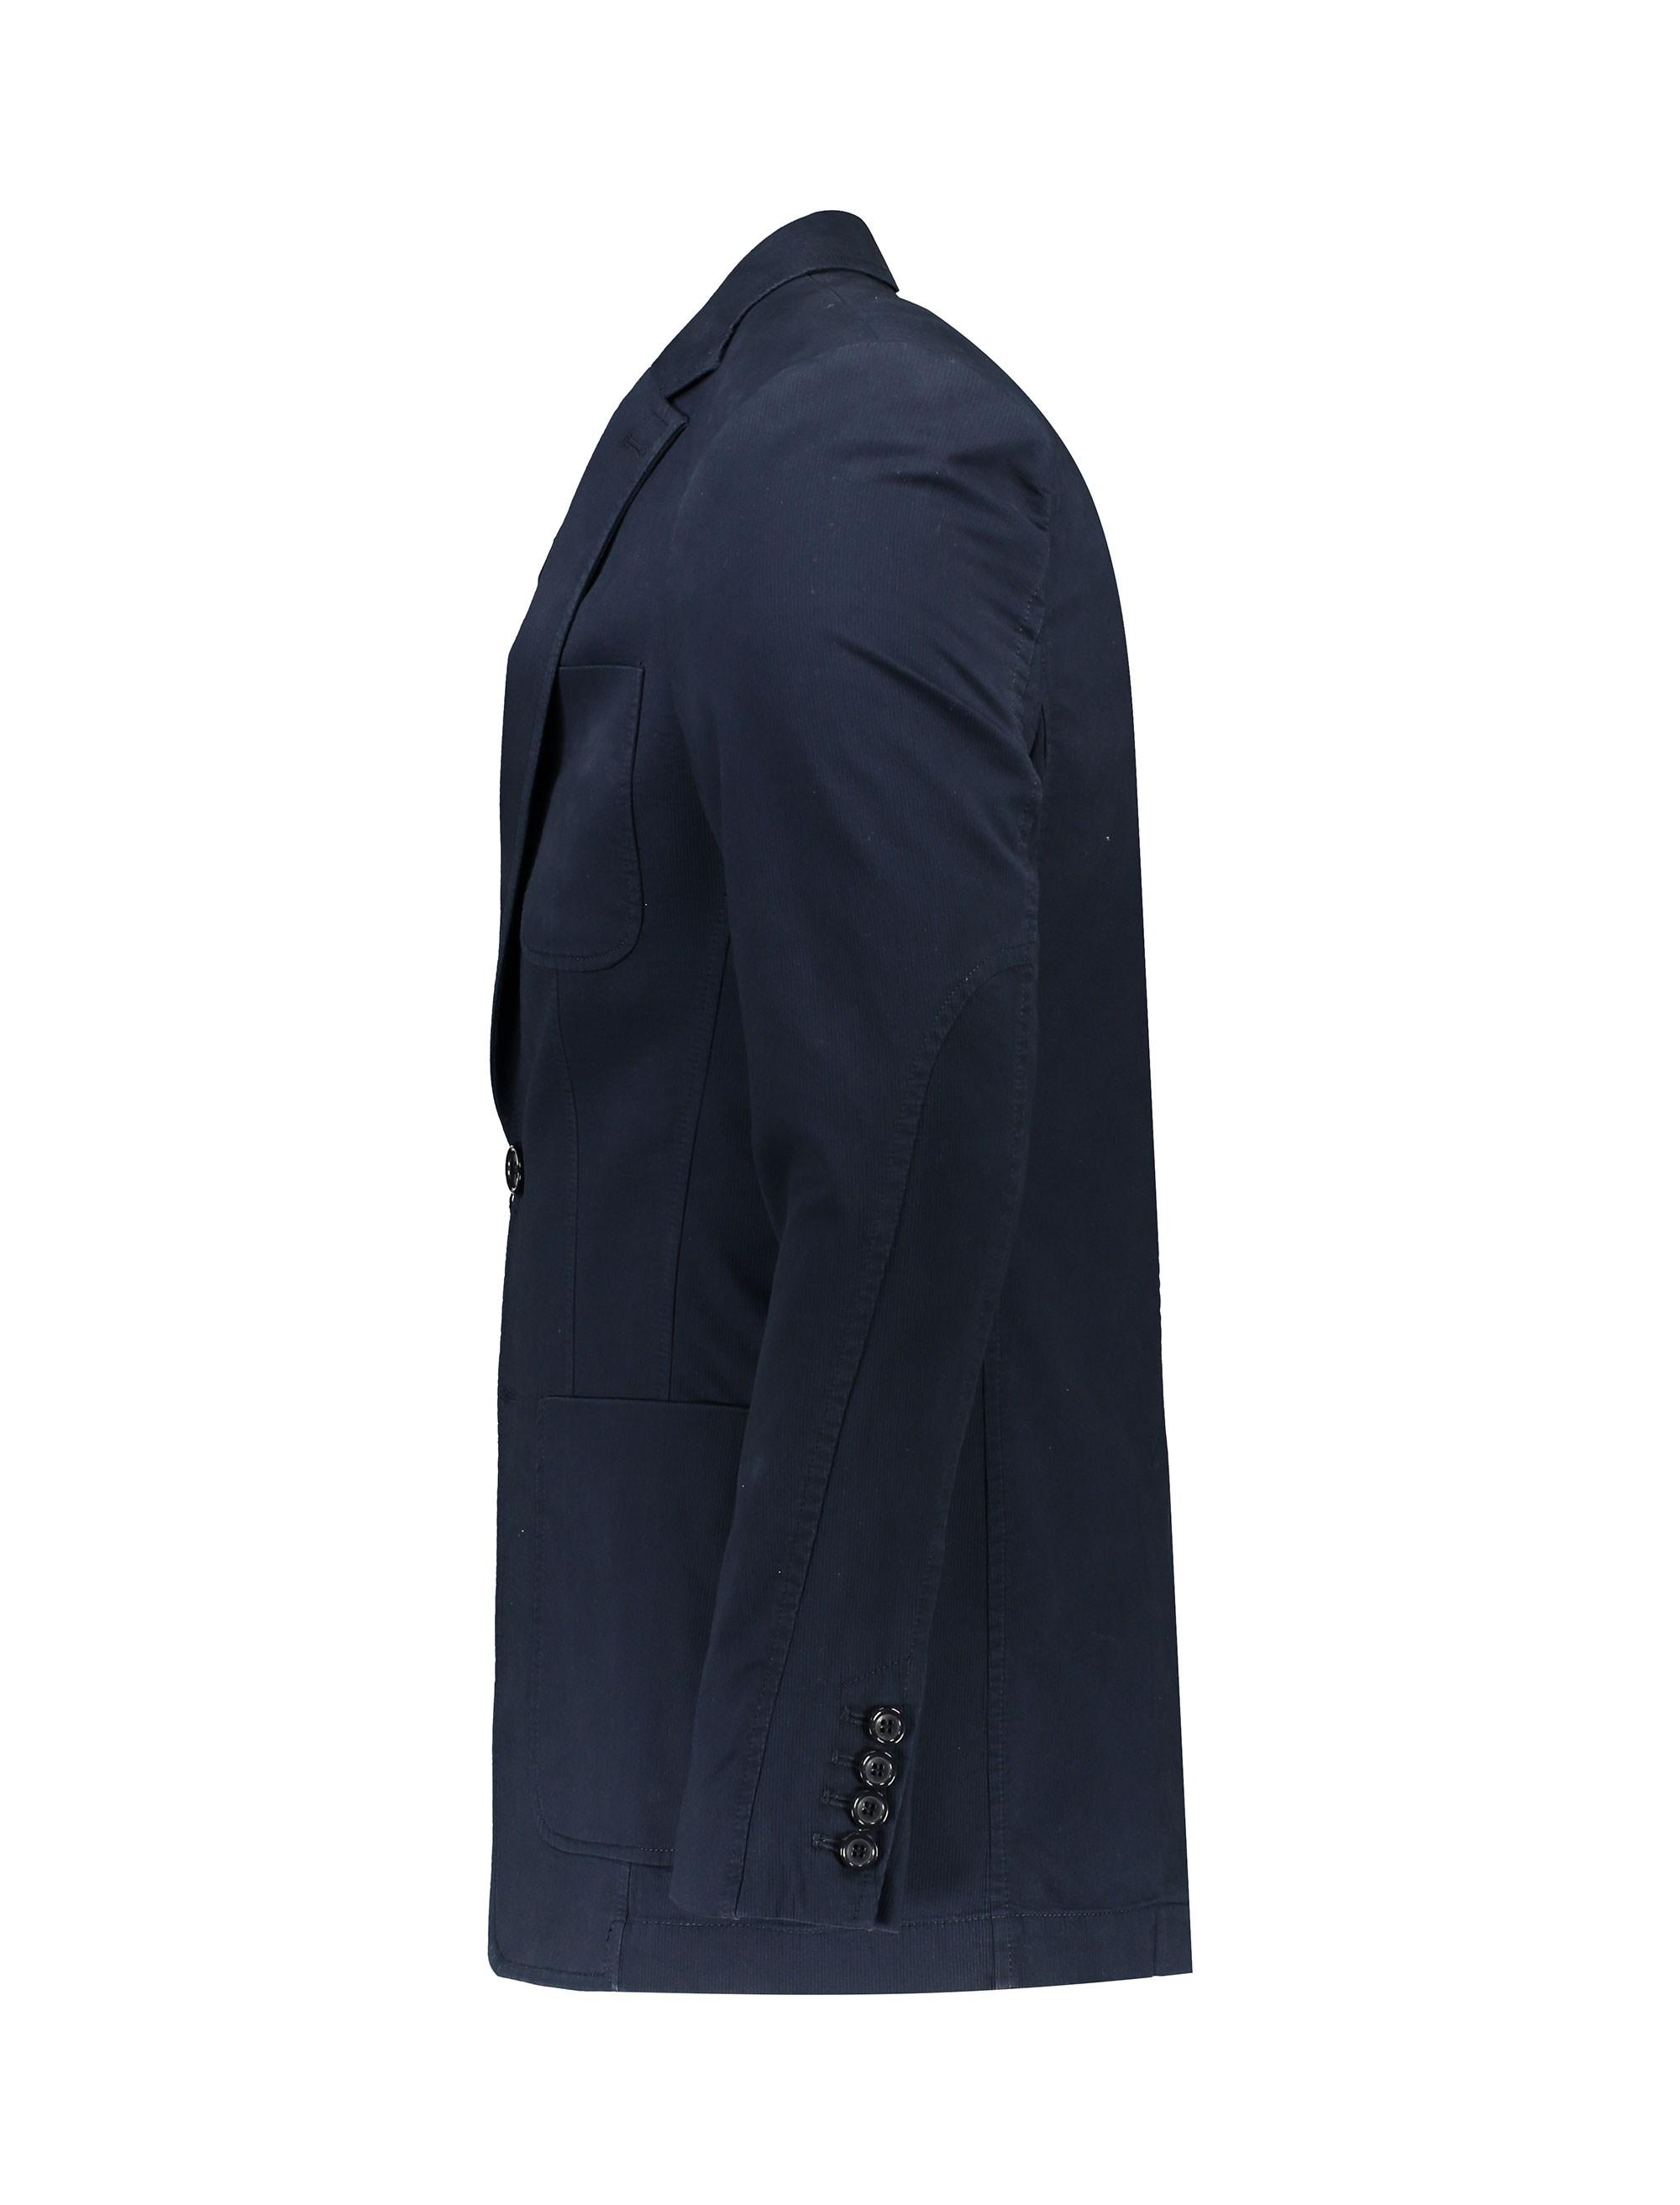 کت تک غیر رسمی نخی مردانه - زاگرس پوش - سرمه اي - 2